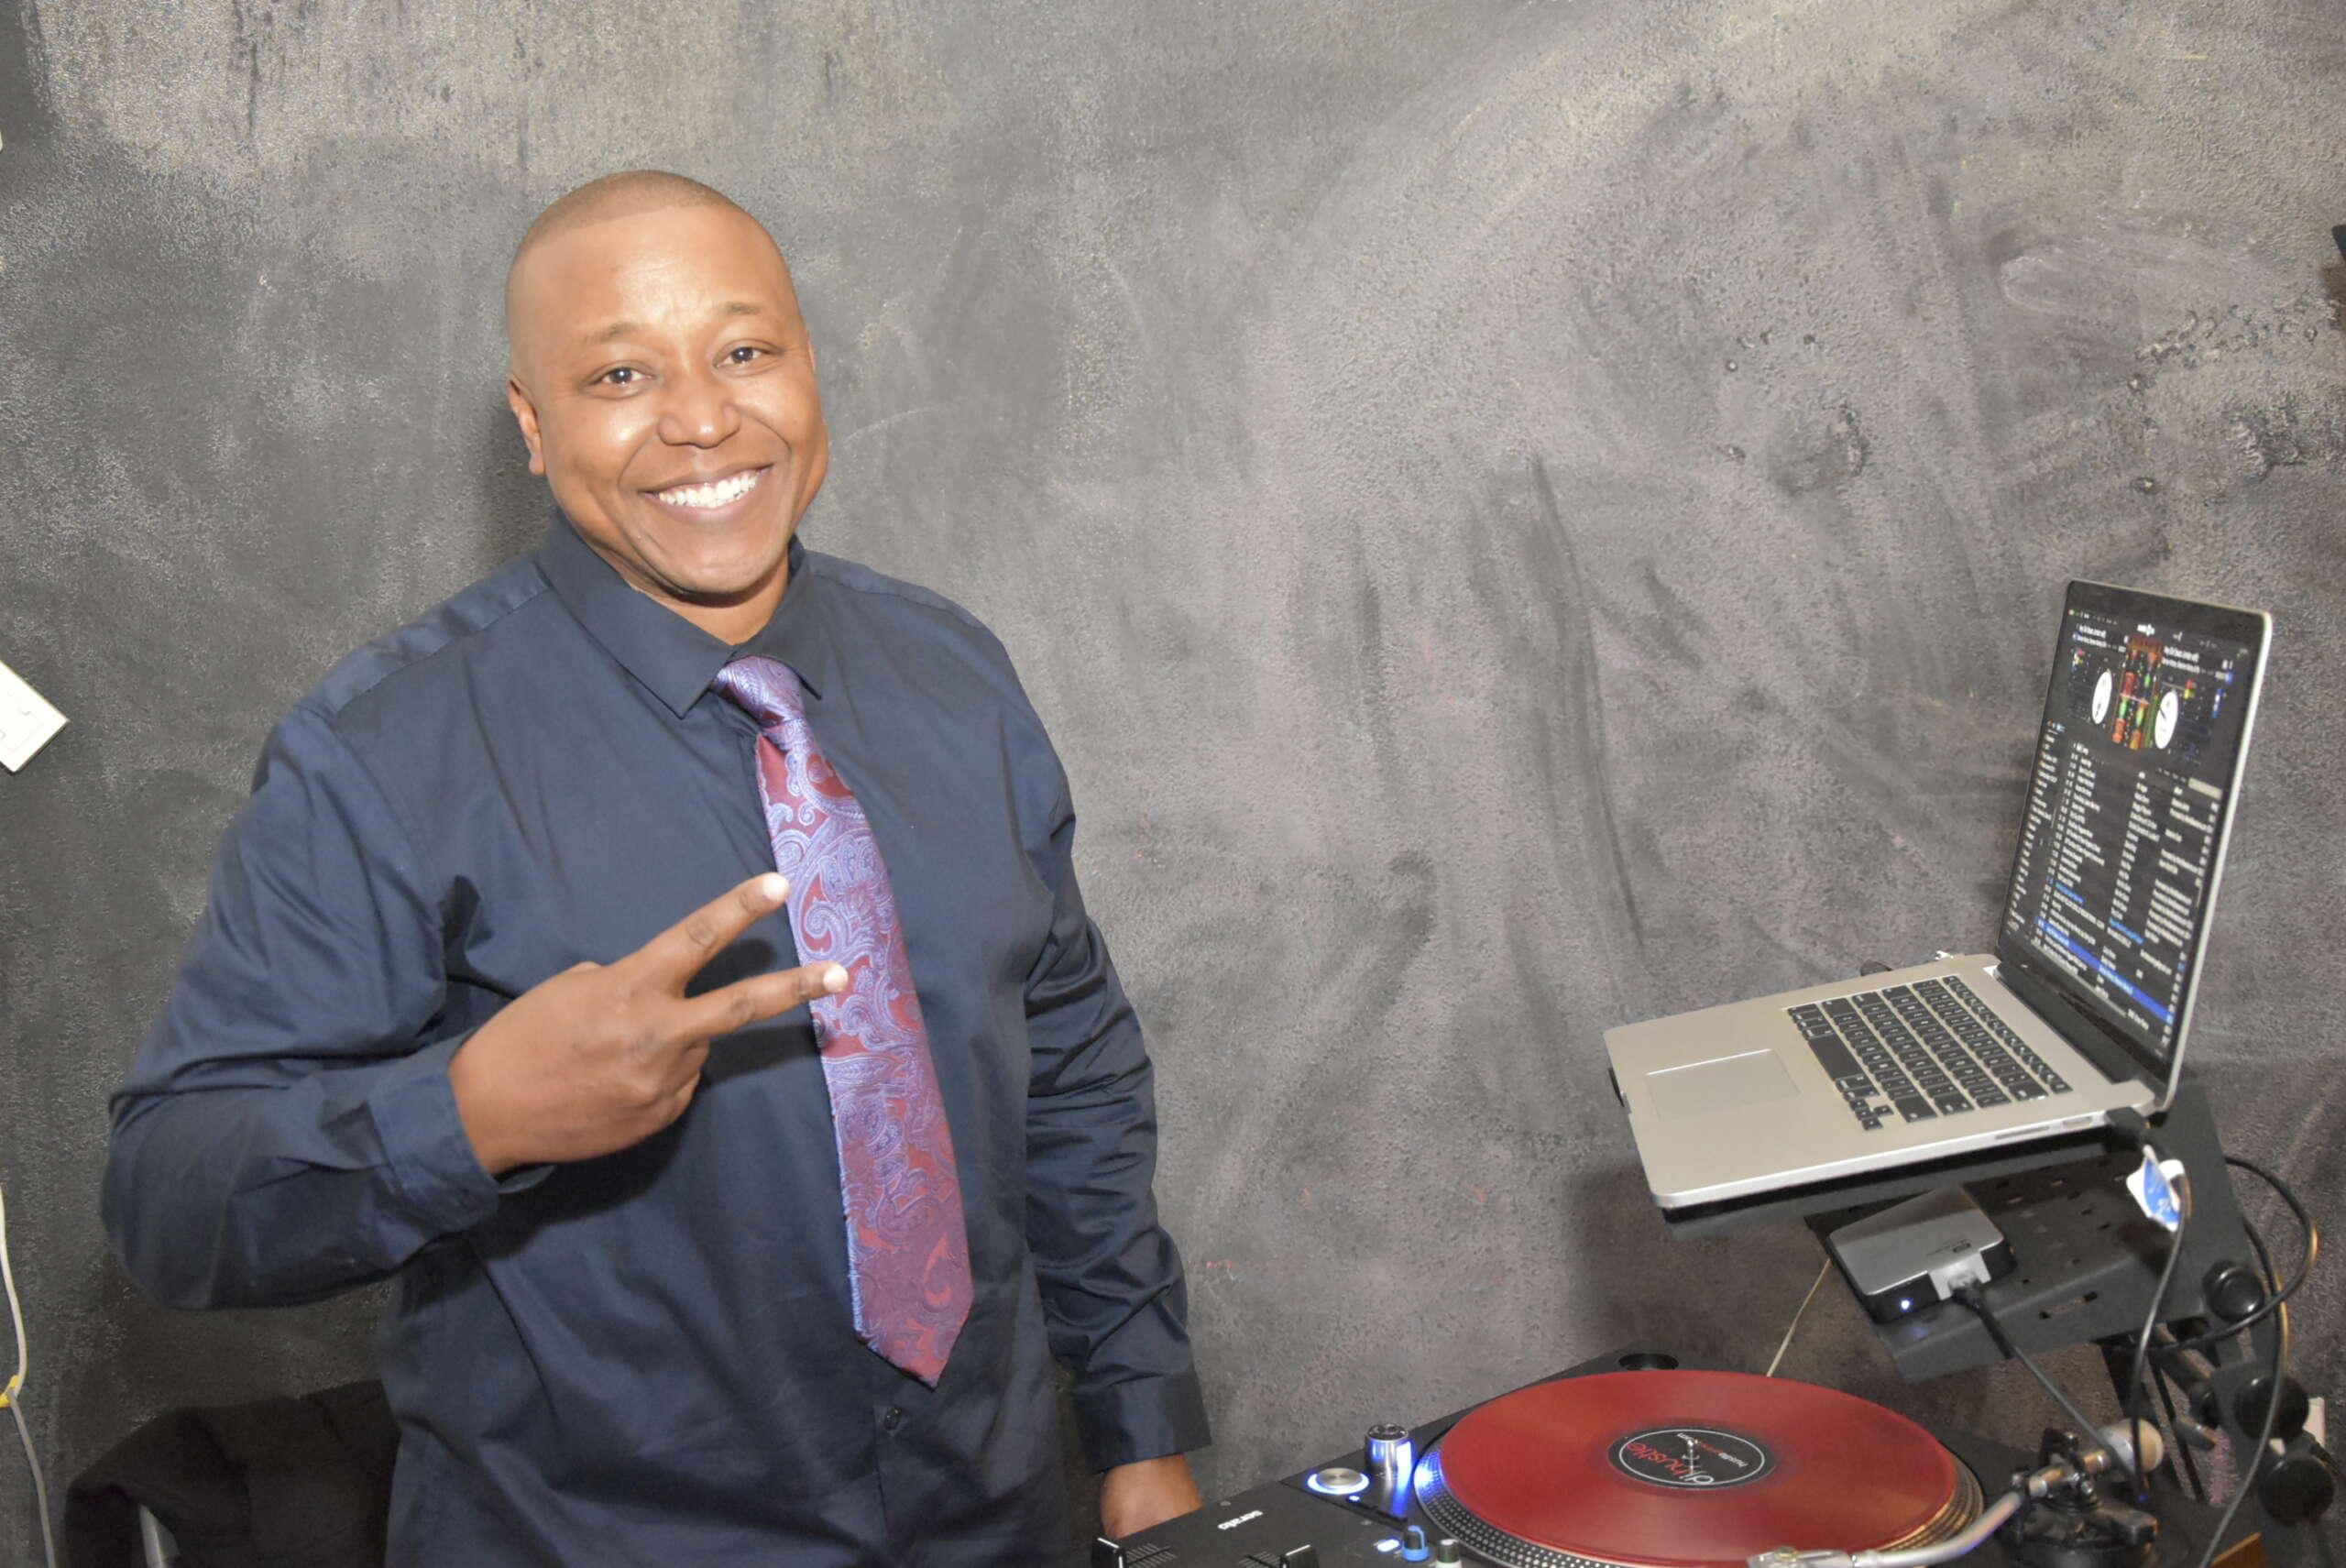 Introducing DJ Hustle, DJ, Producer, Artist, Photographer, Actor and Author